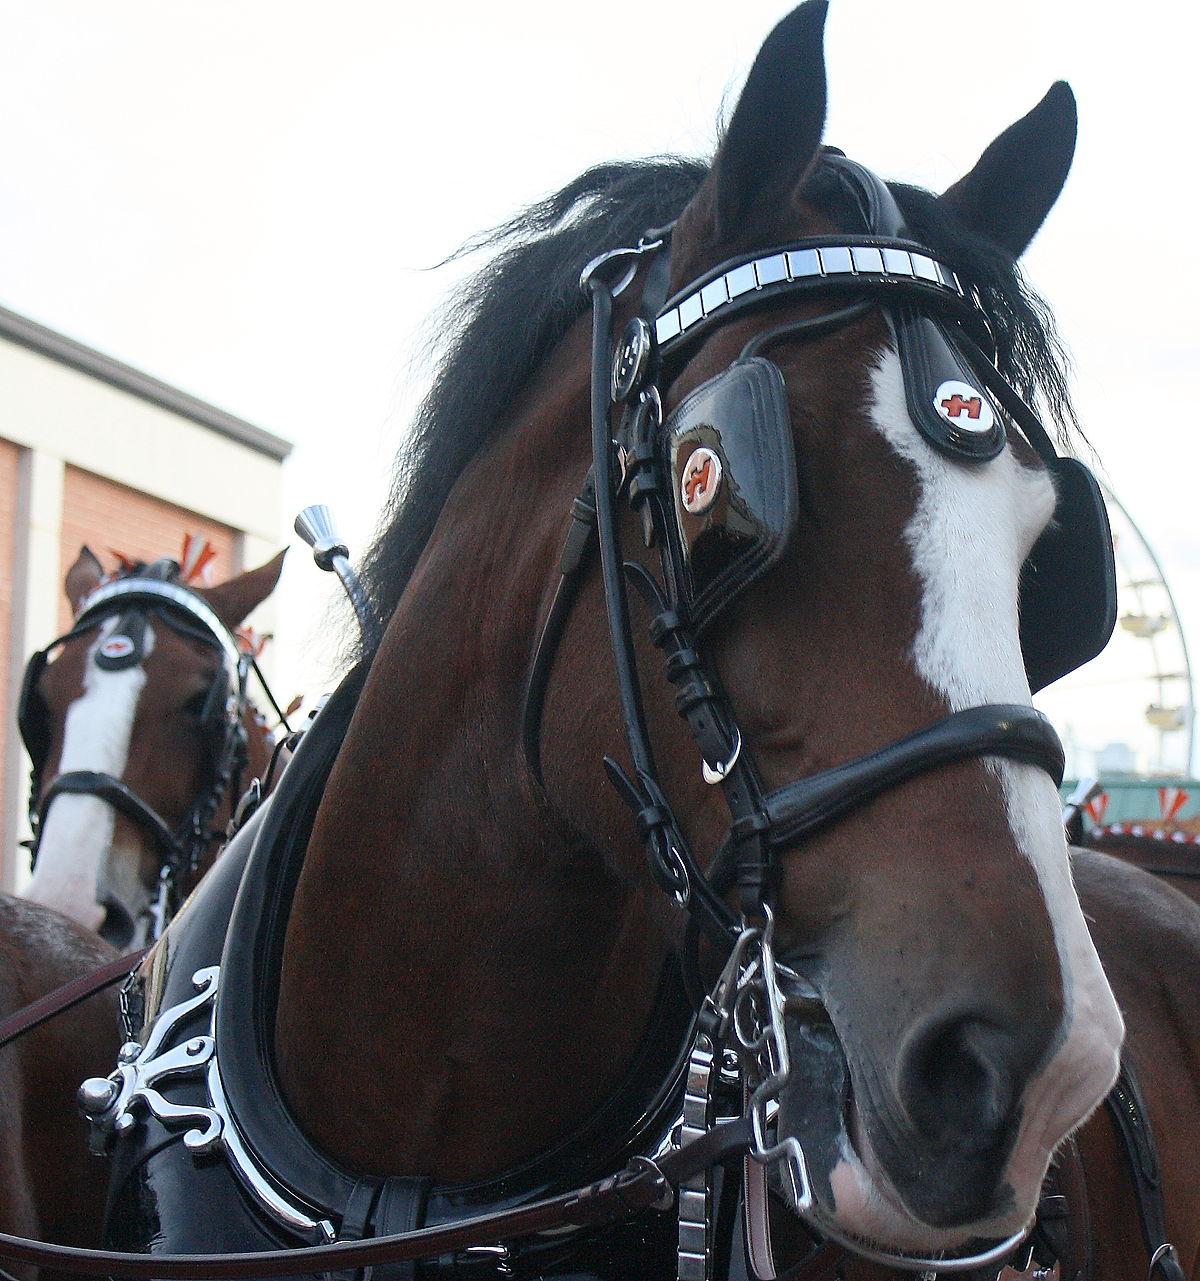 [Image: 1200px-Horses_2.jpg]